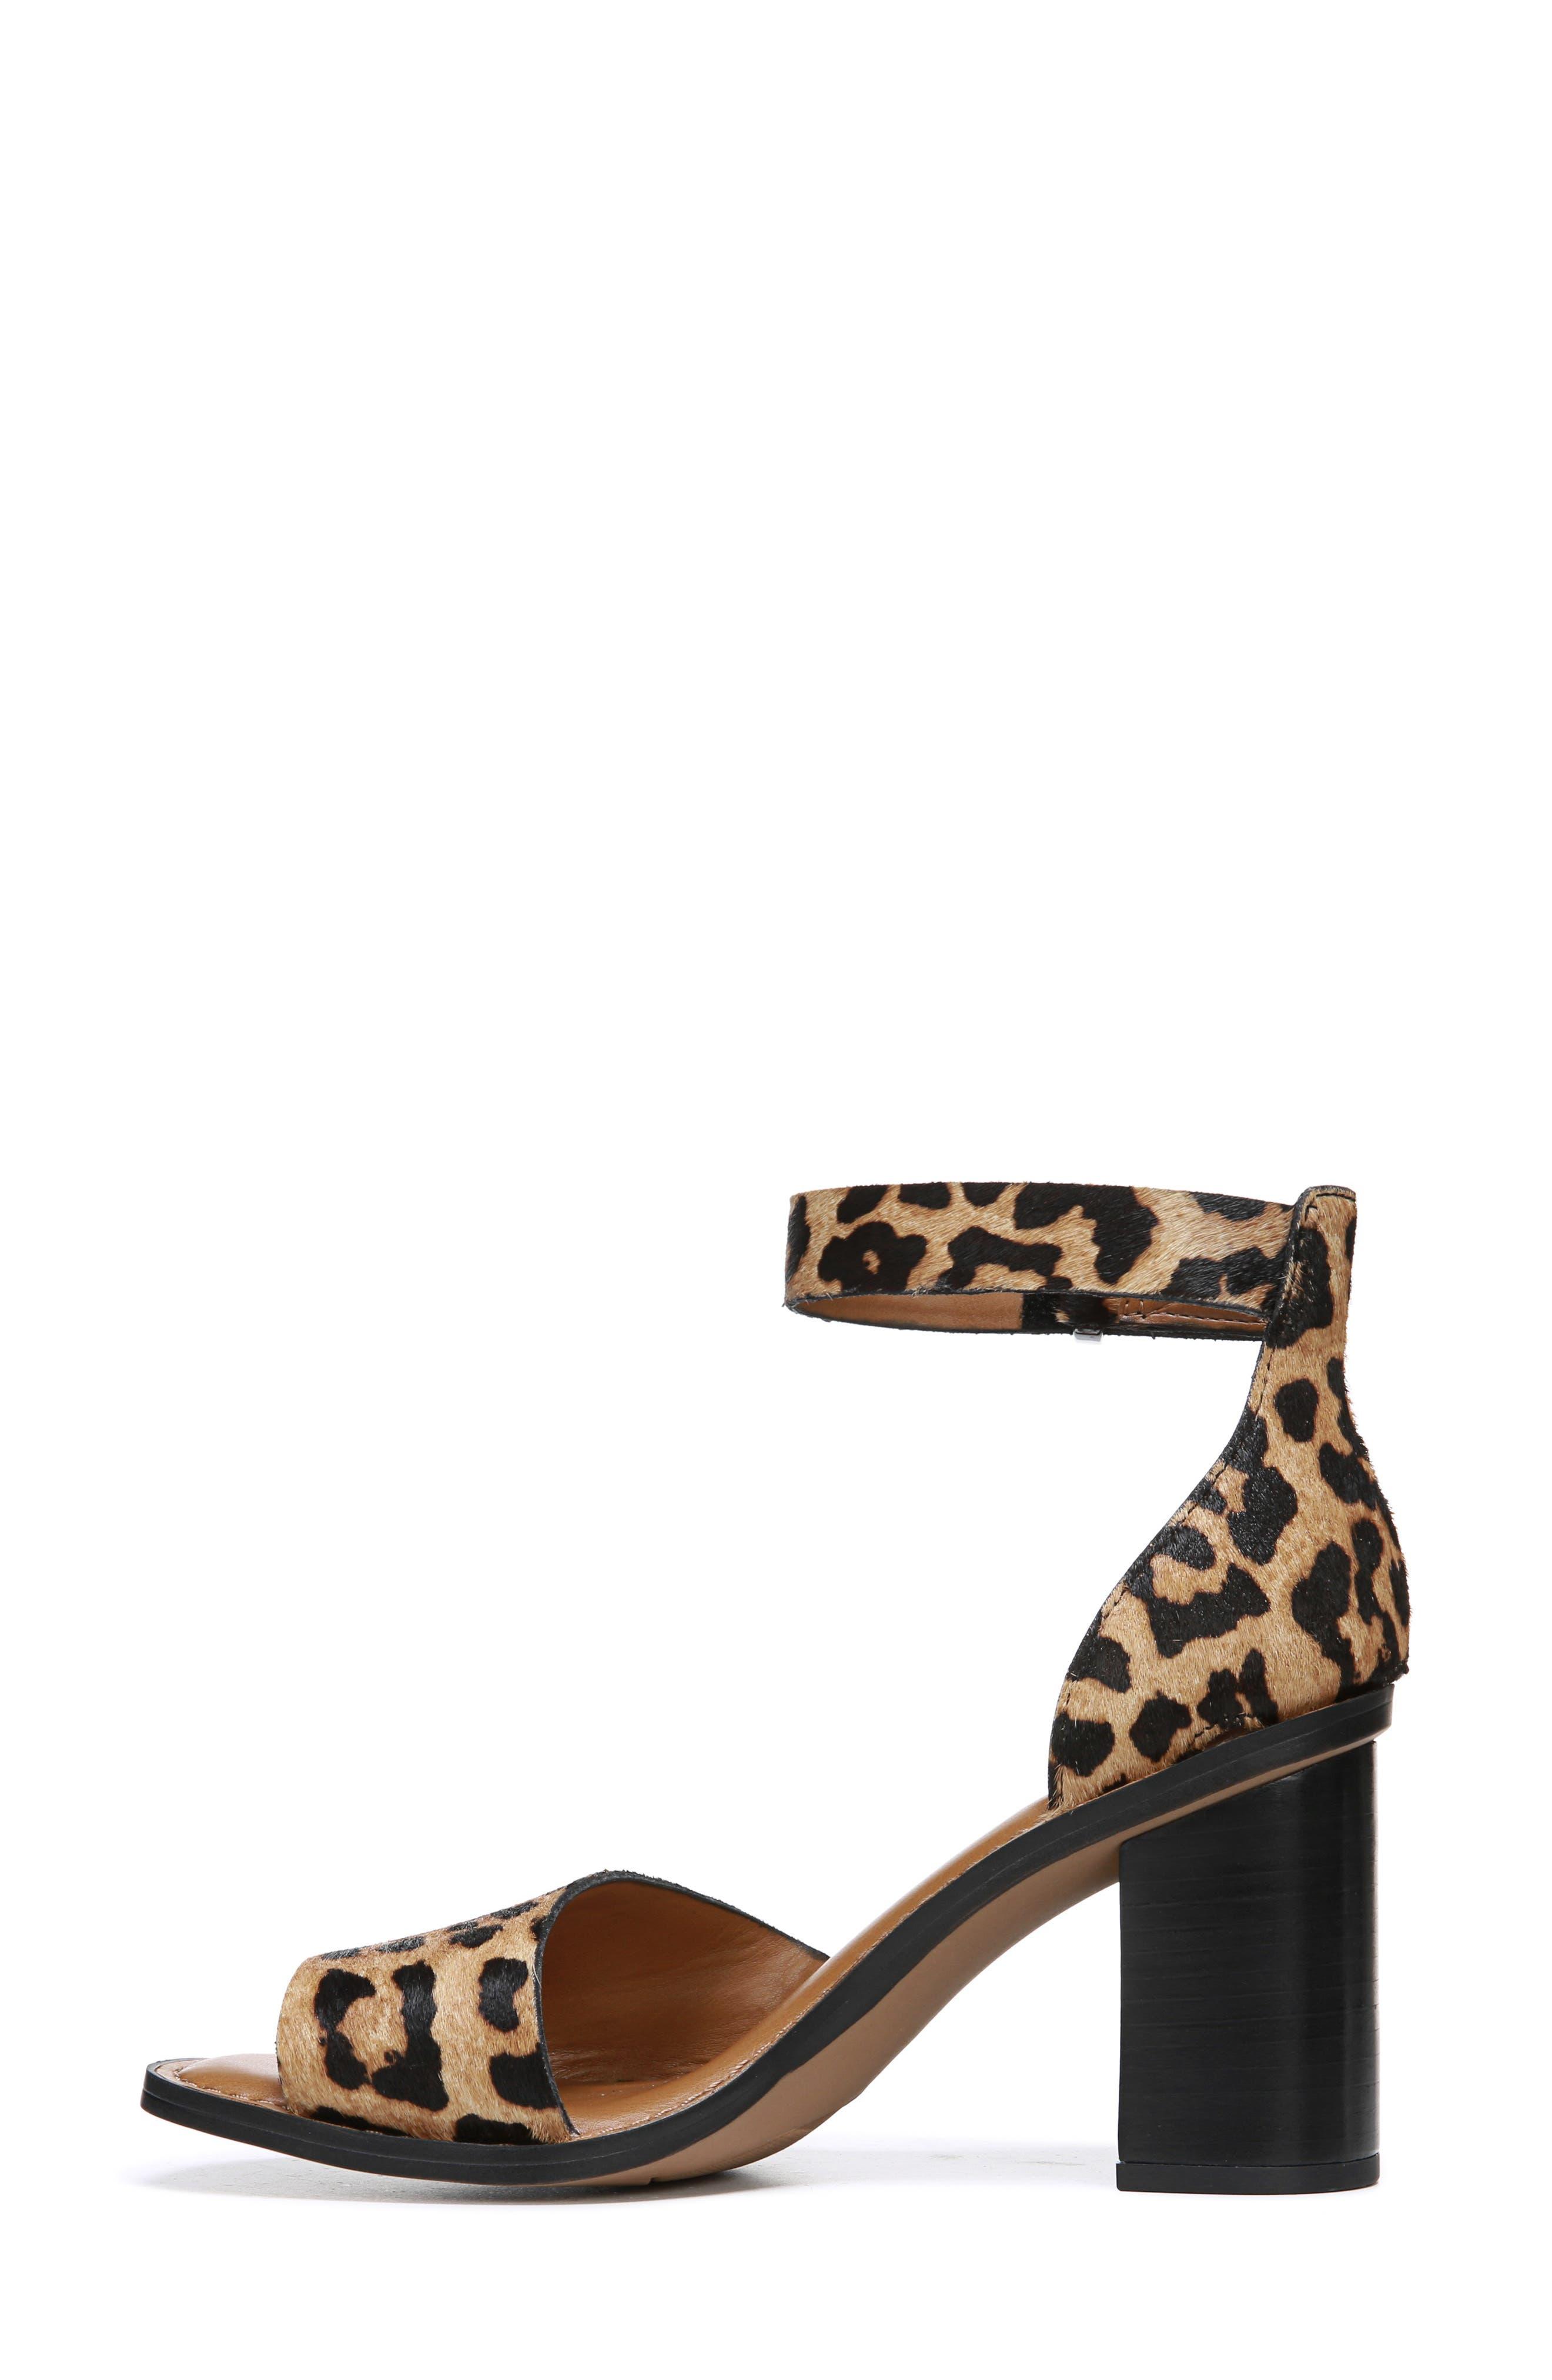 FRANCO SARTO, Caia Ankle Strap Sandal, Alternate thumbnail 8, color, BROWN CALF HAIR